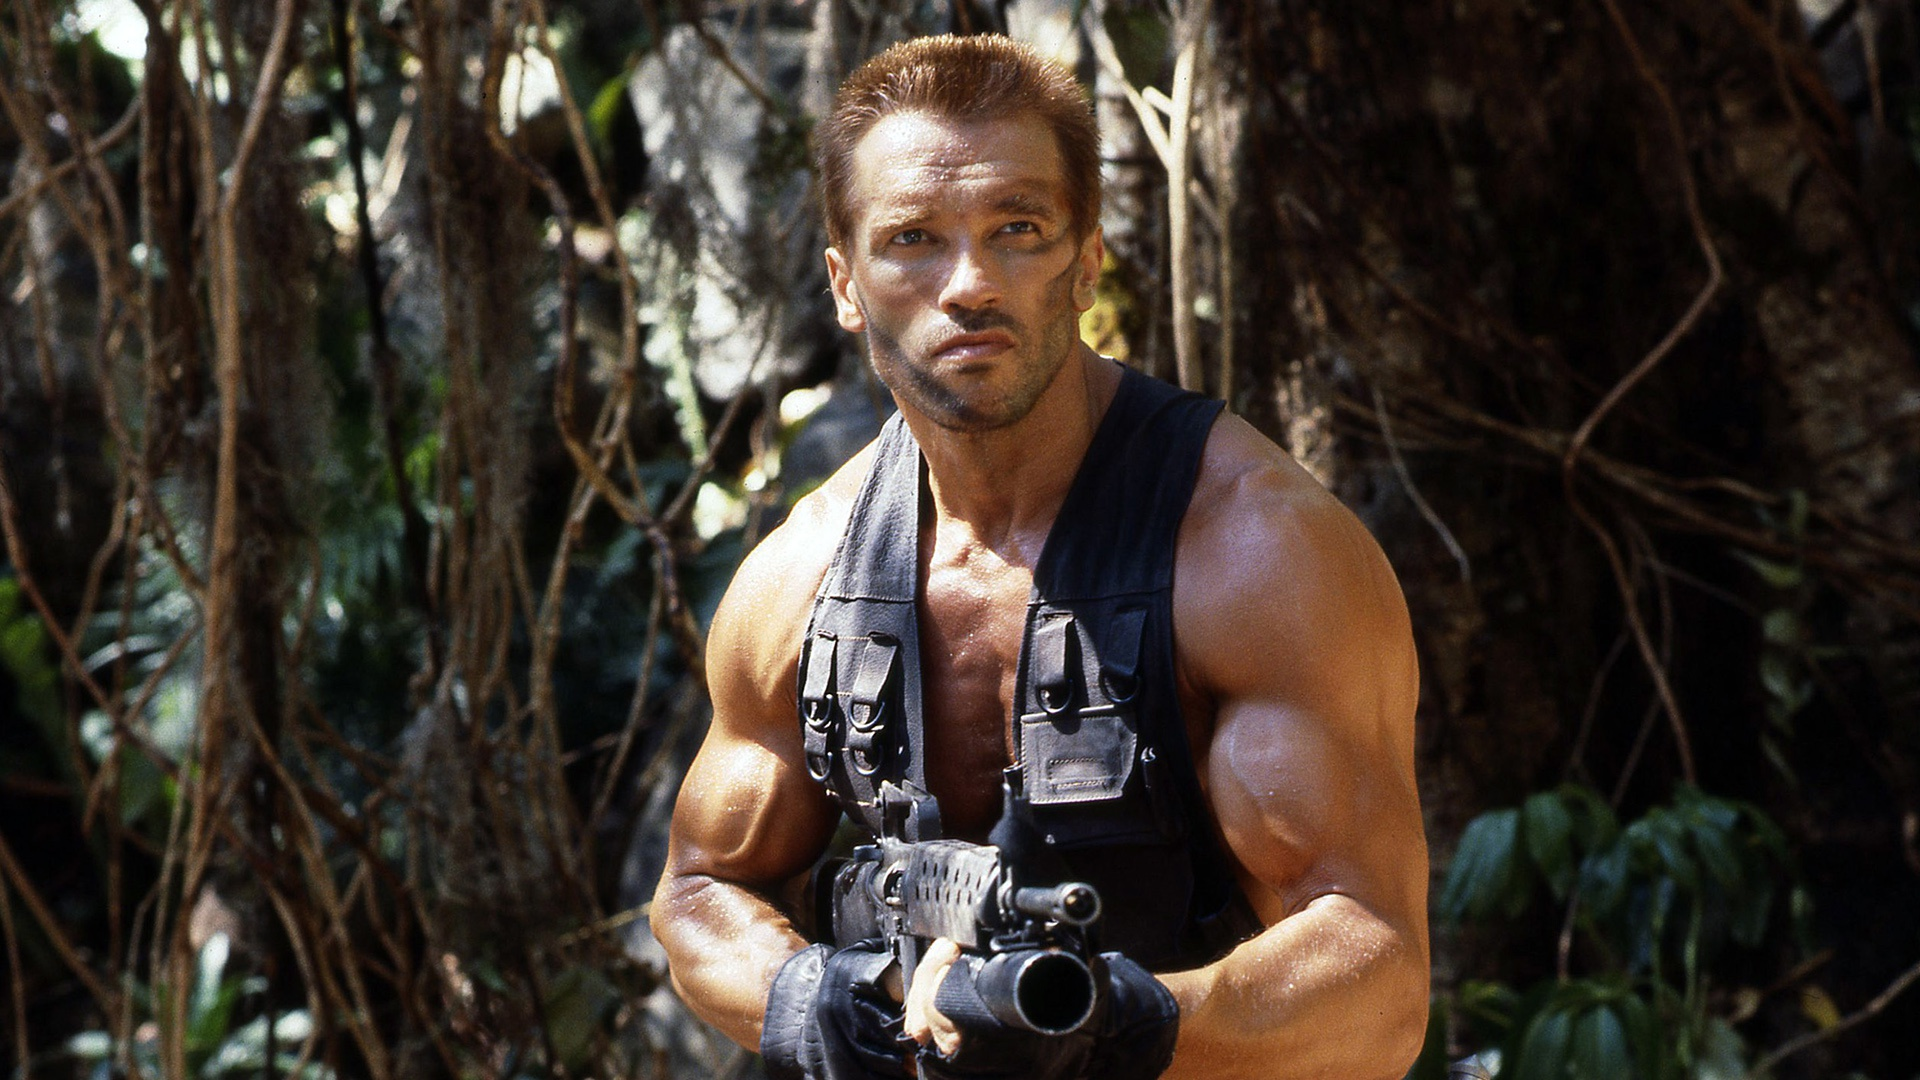 People 1920x1080 1987 (Year) movies muscles Arnold Schwarzenegger weapon Predator (movie) men film stills AR-15 grenade launchers gloves jungle actor